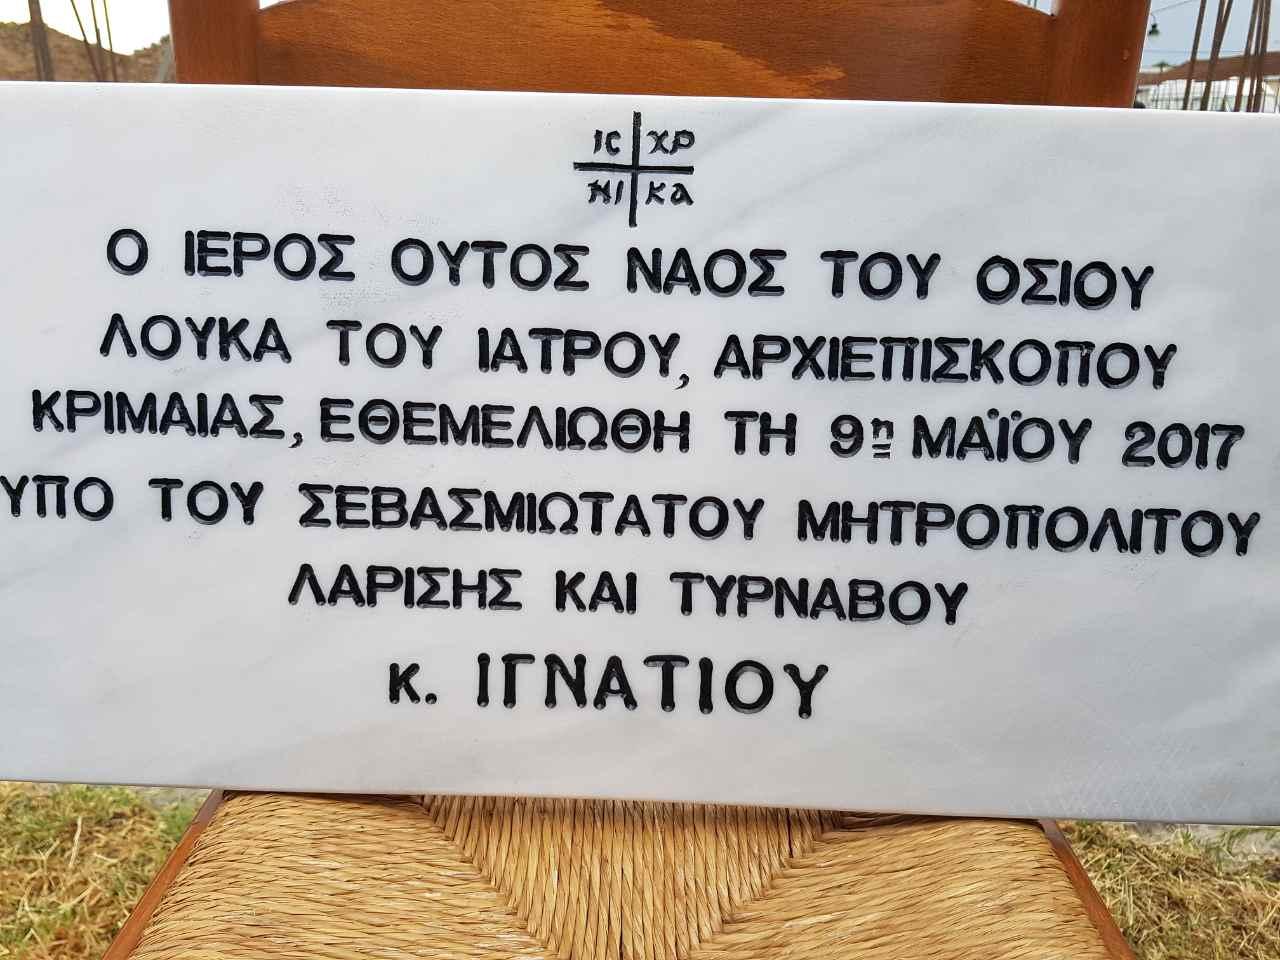 themeliwsi_aglouka_ampelwna (7)